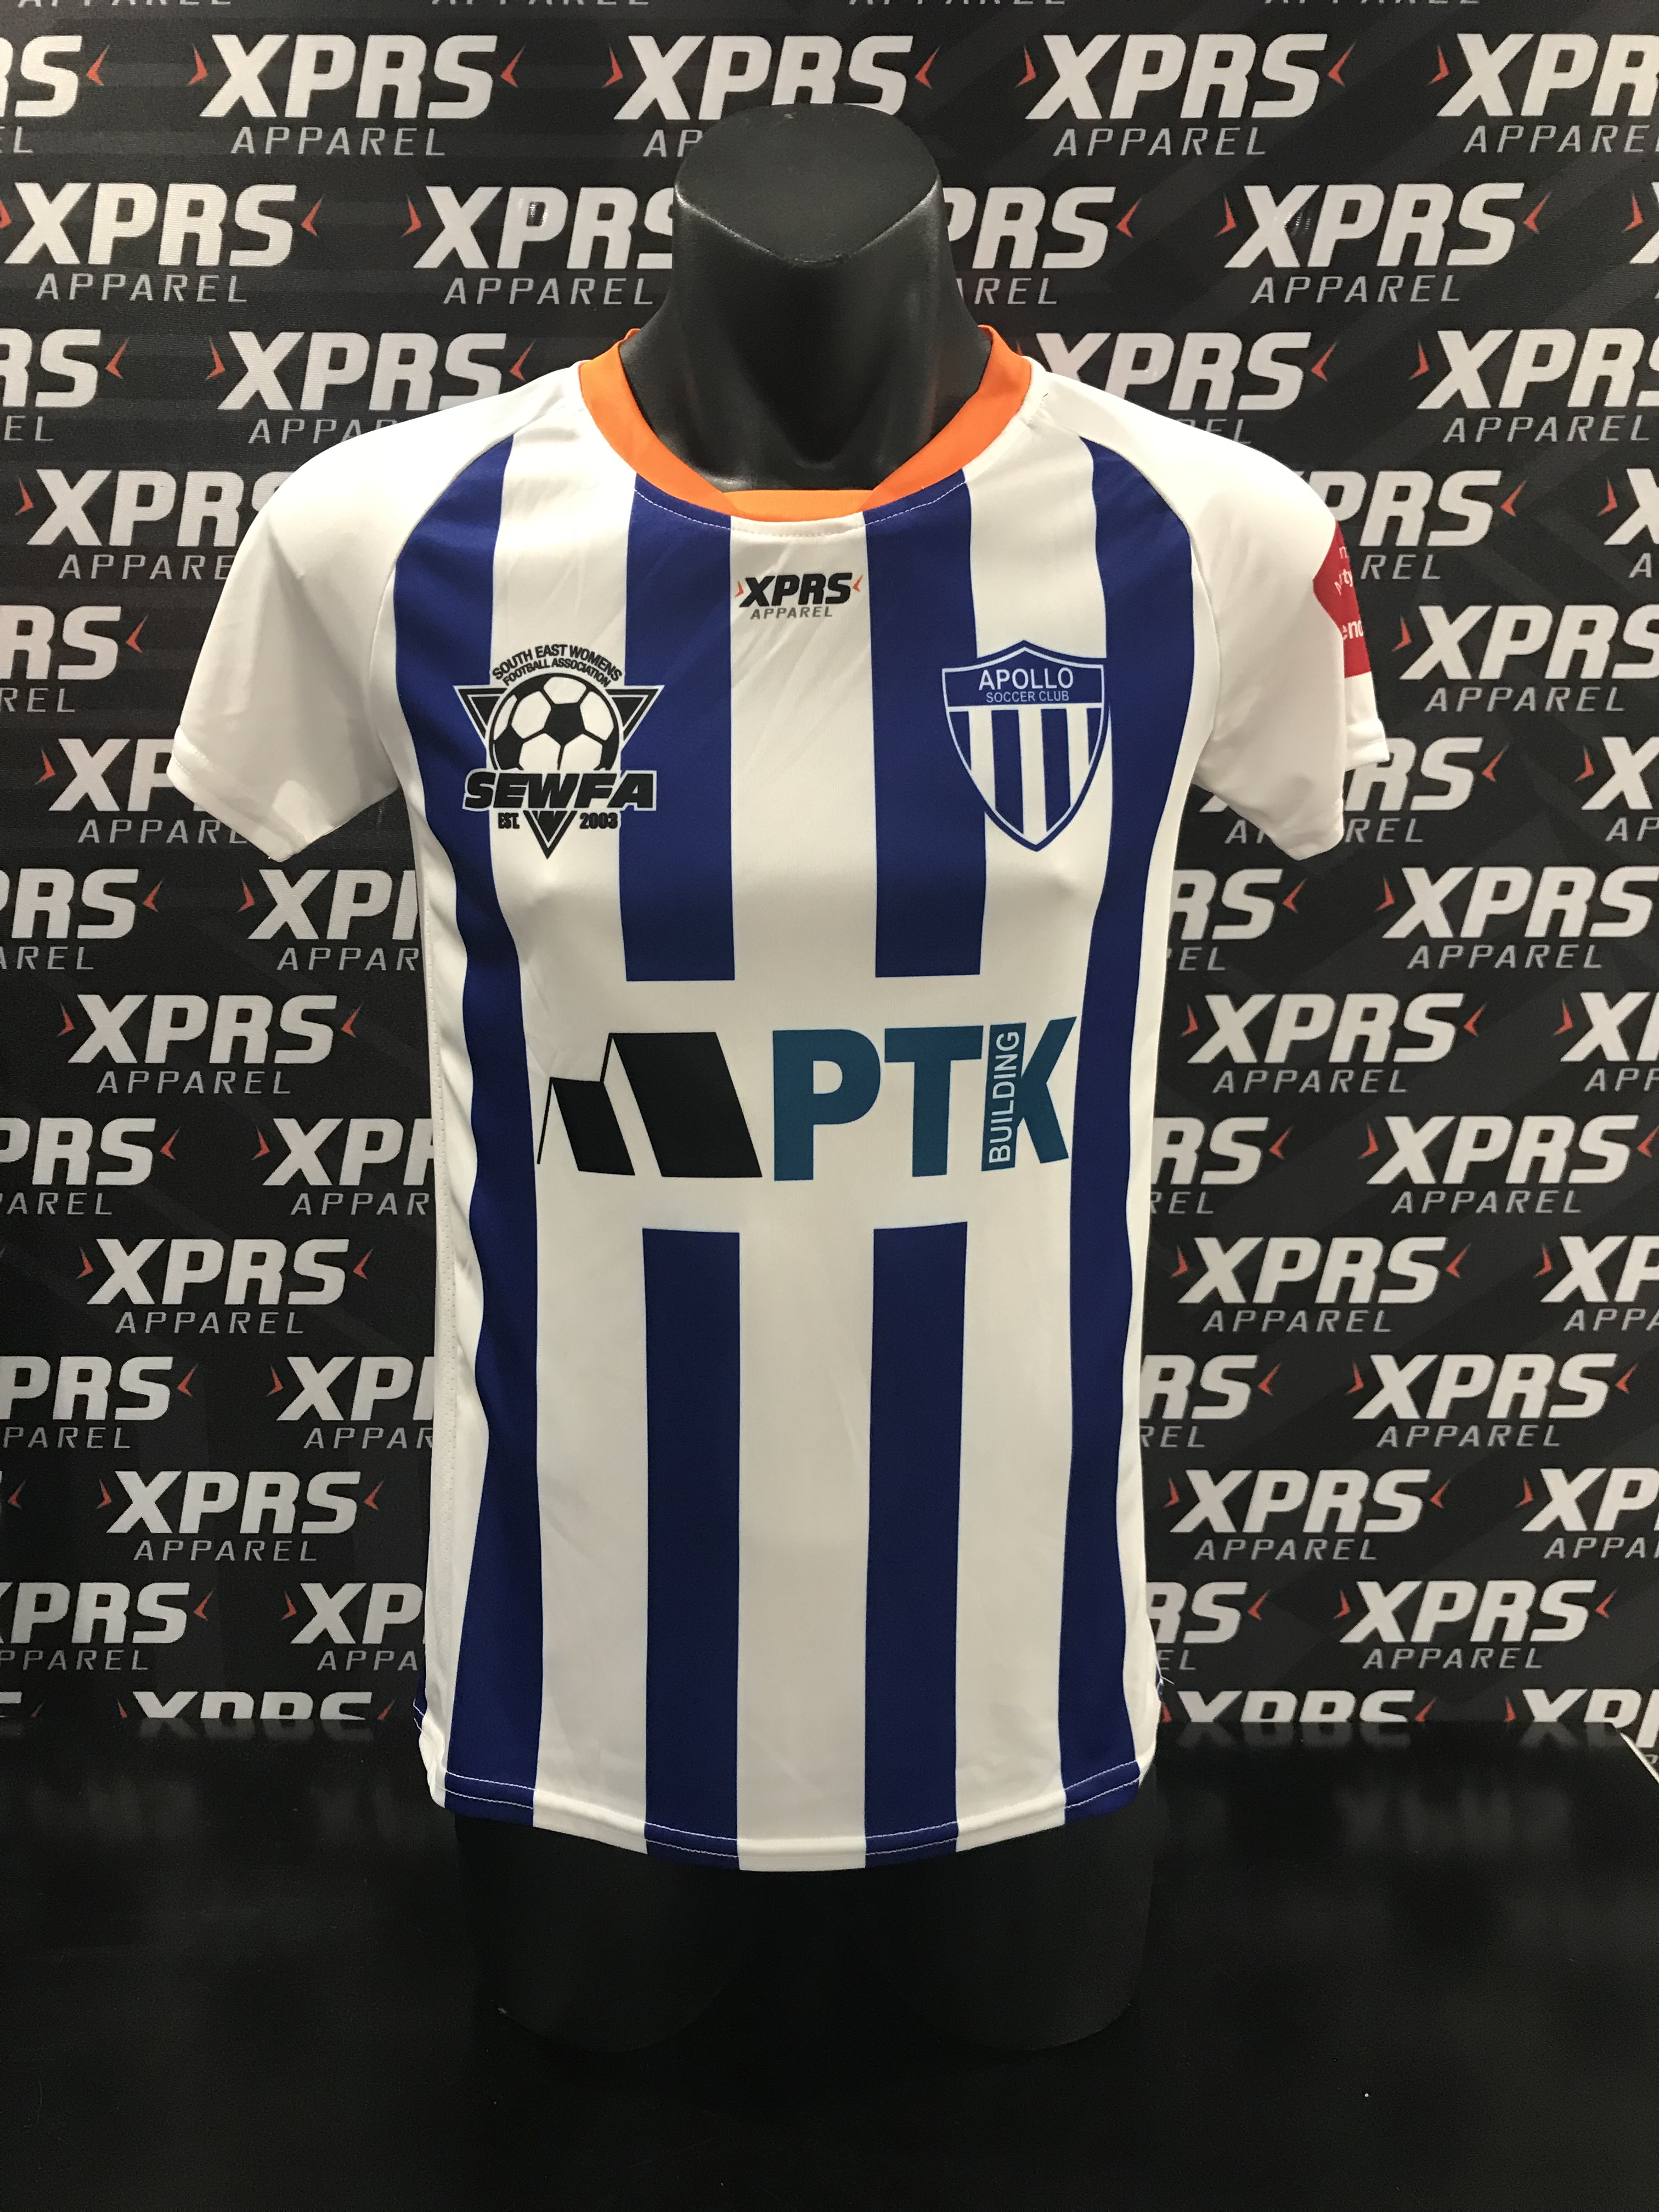 Apollo CFC Soccer Jersey's